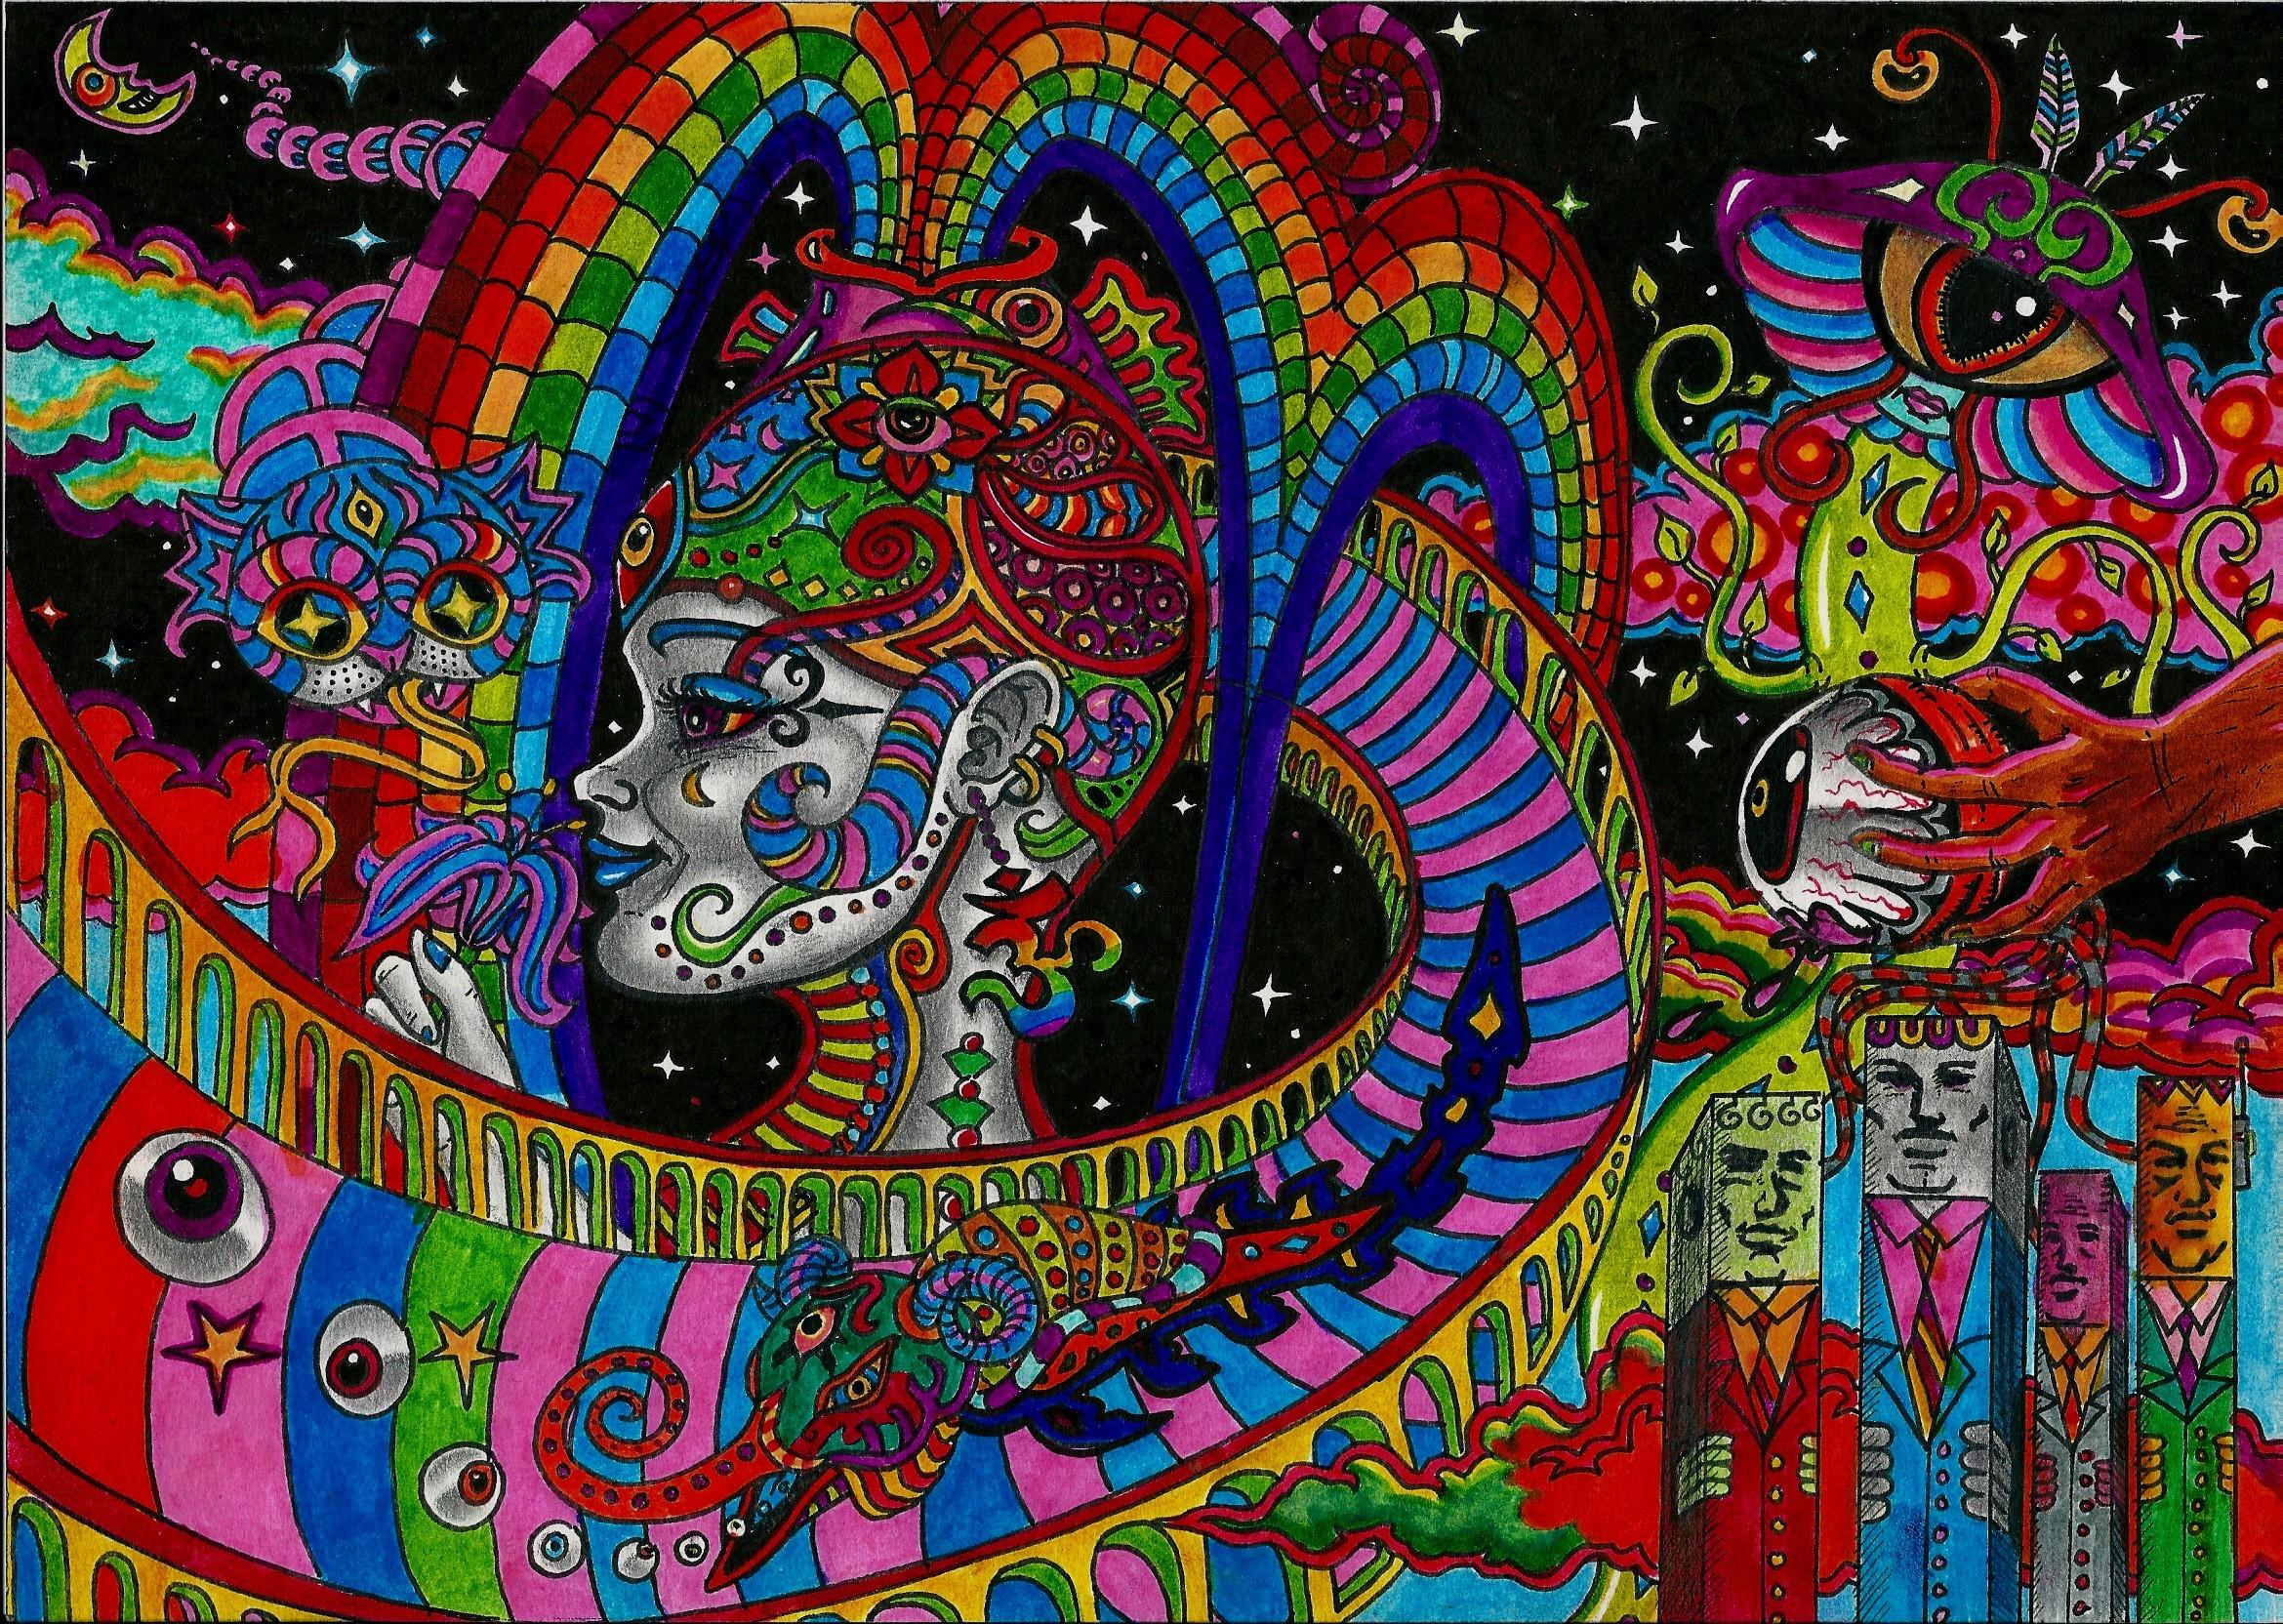 Res: 2339x1664, Trippy Acid Wallpaper High Quality Hd Trip Desktop For Mobile Phones